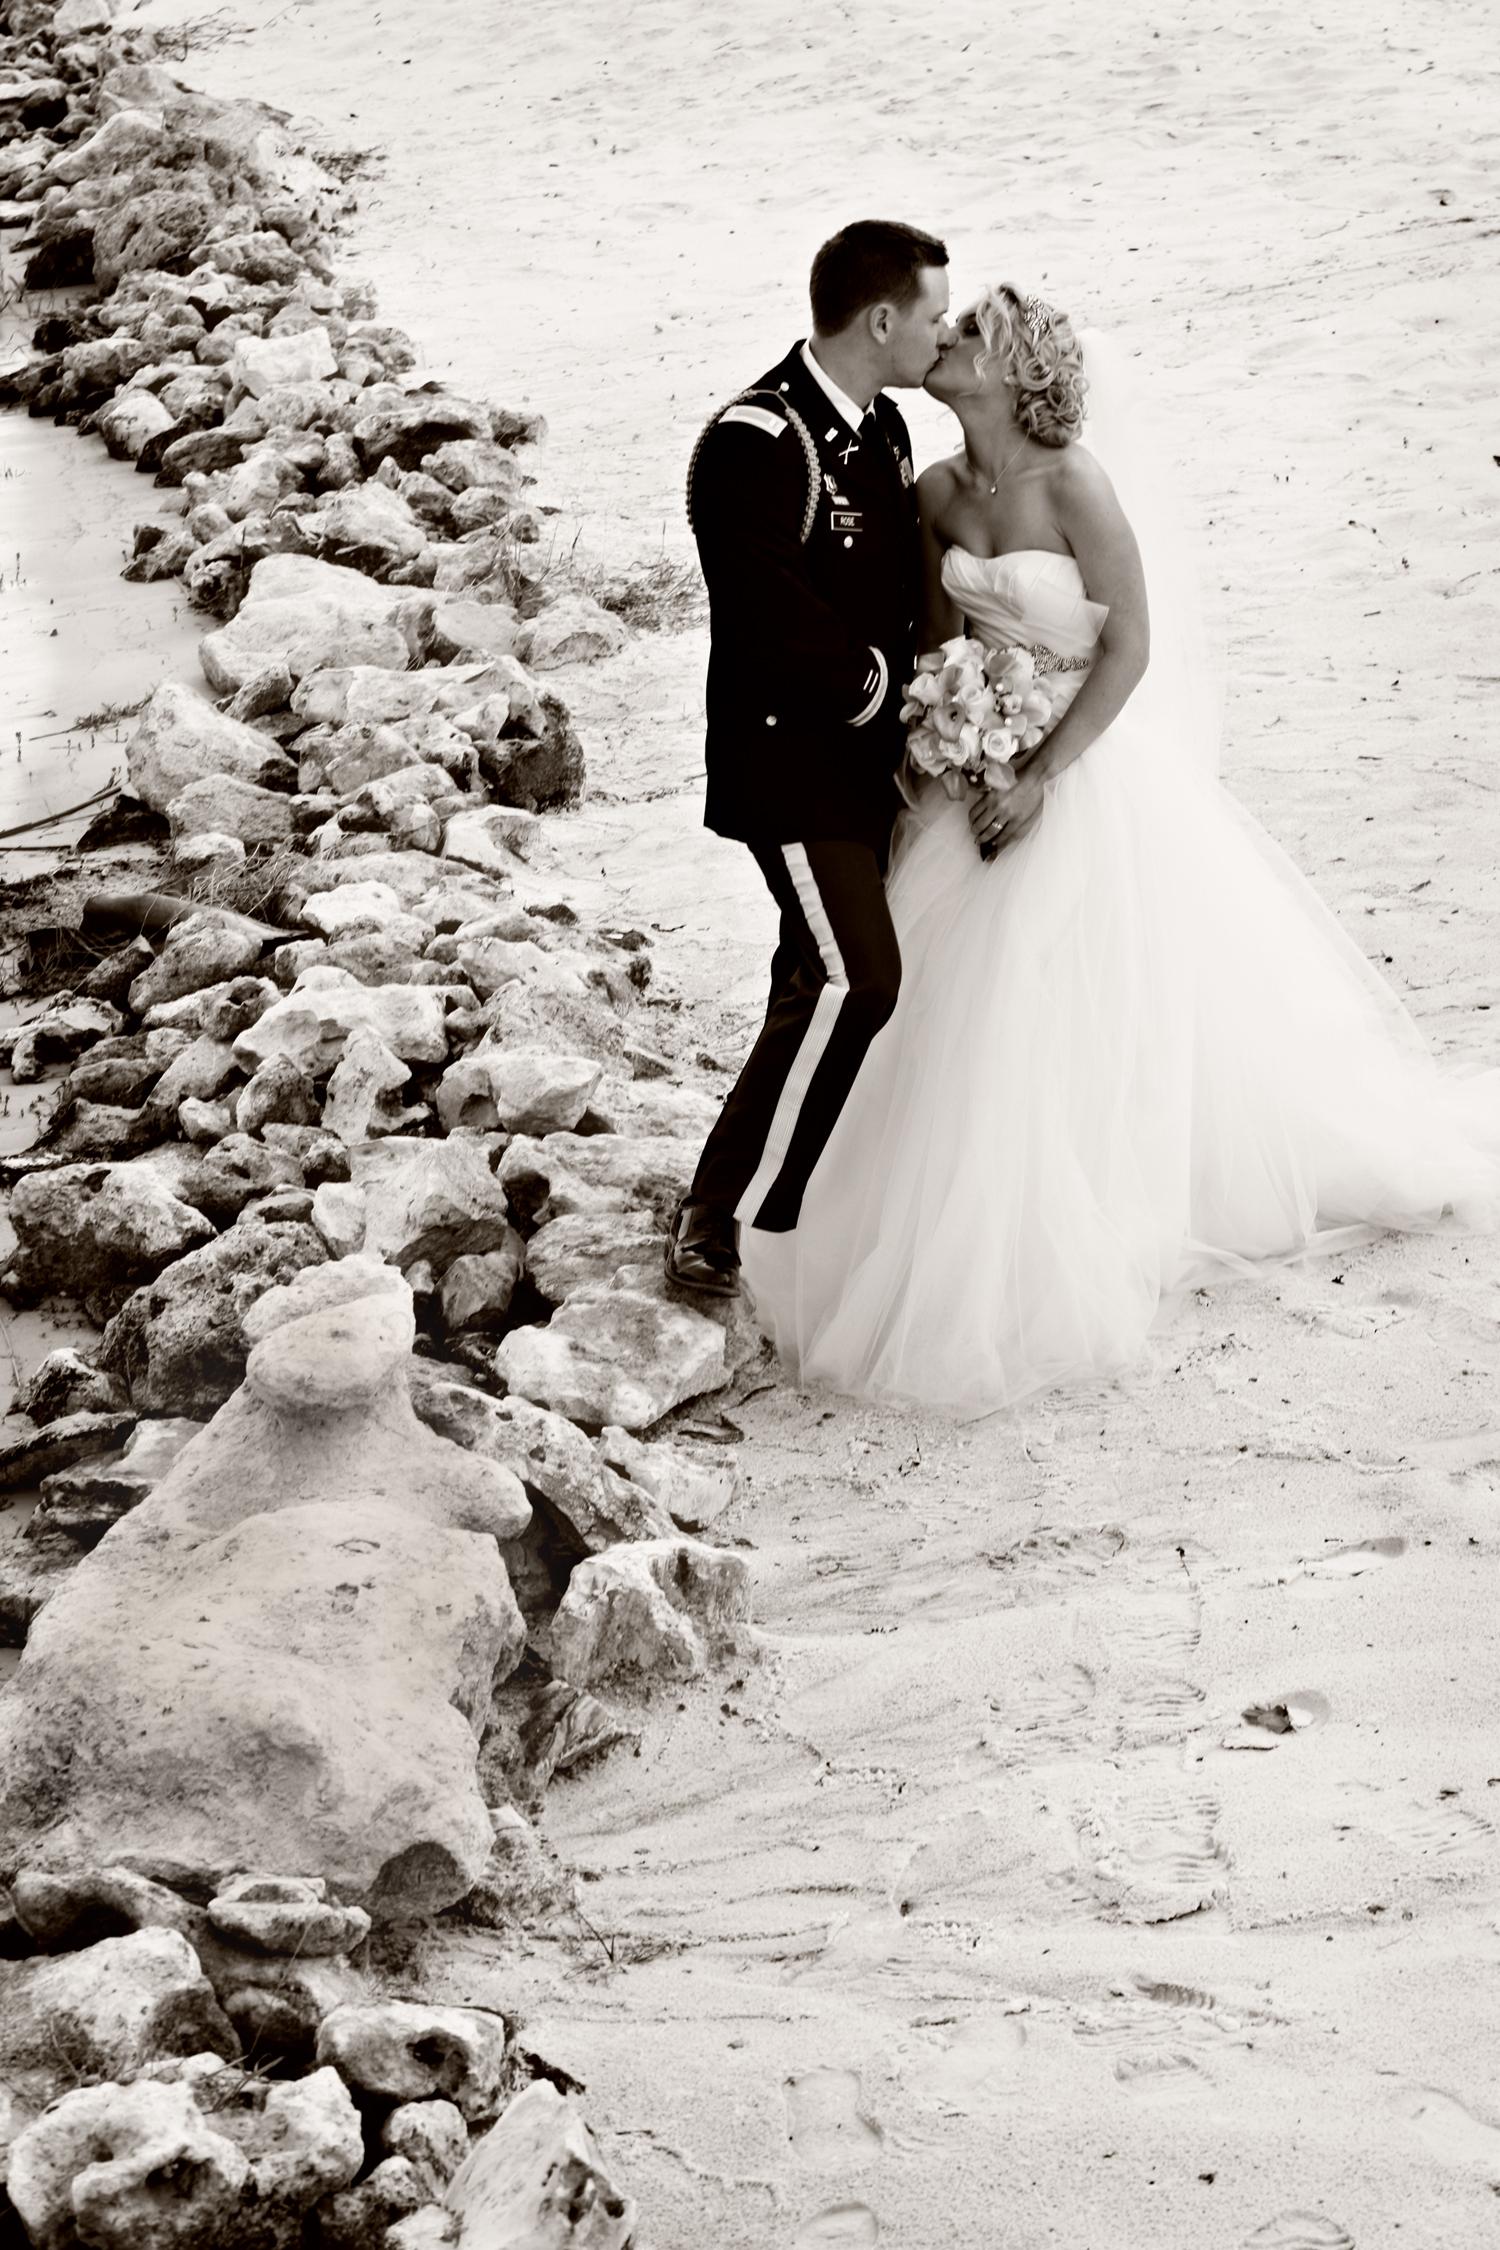 Rick-Ferro-Wedding-Couple-Beach-Rocks.jpg